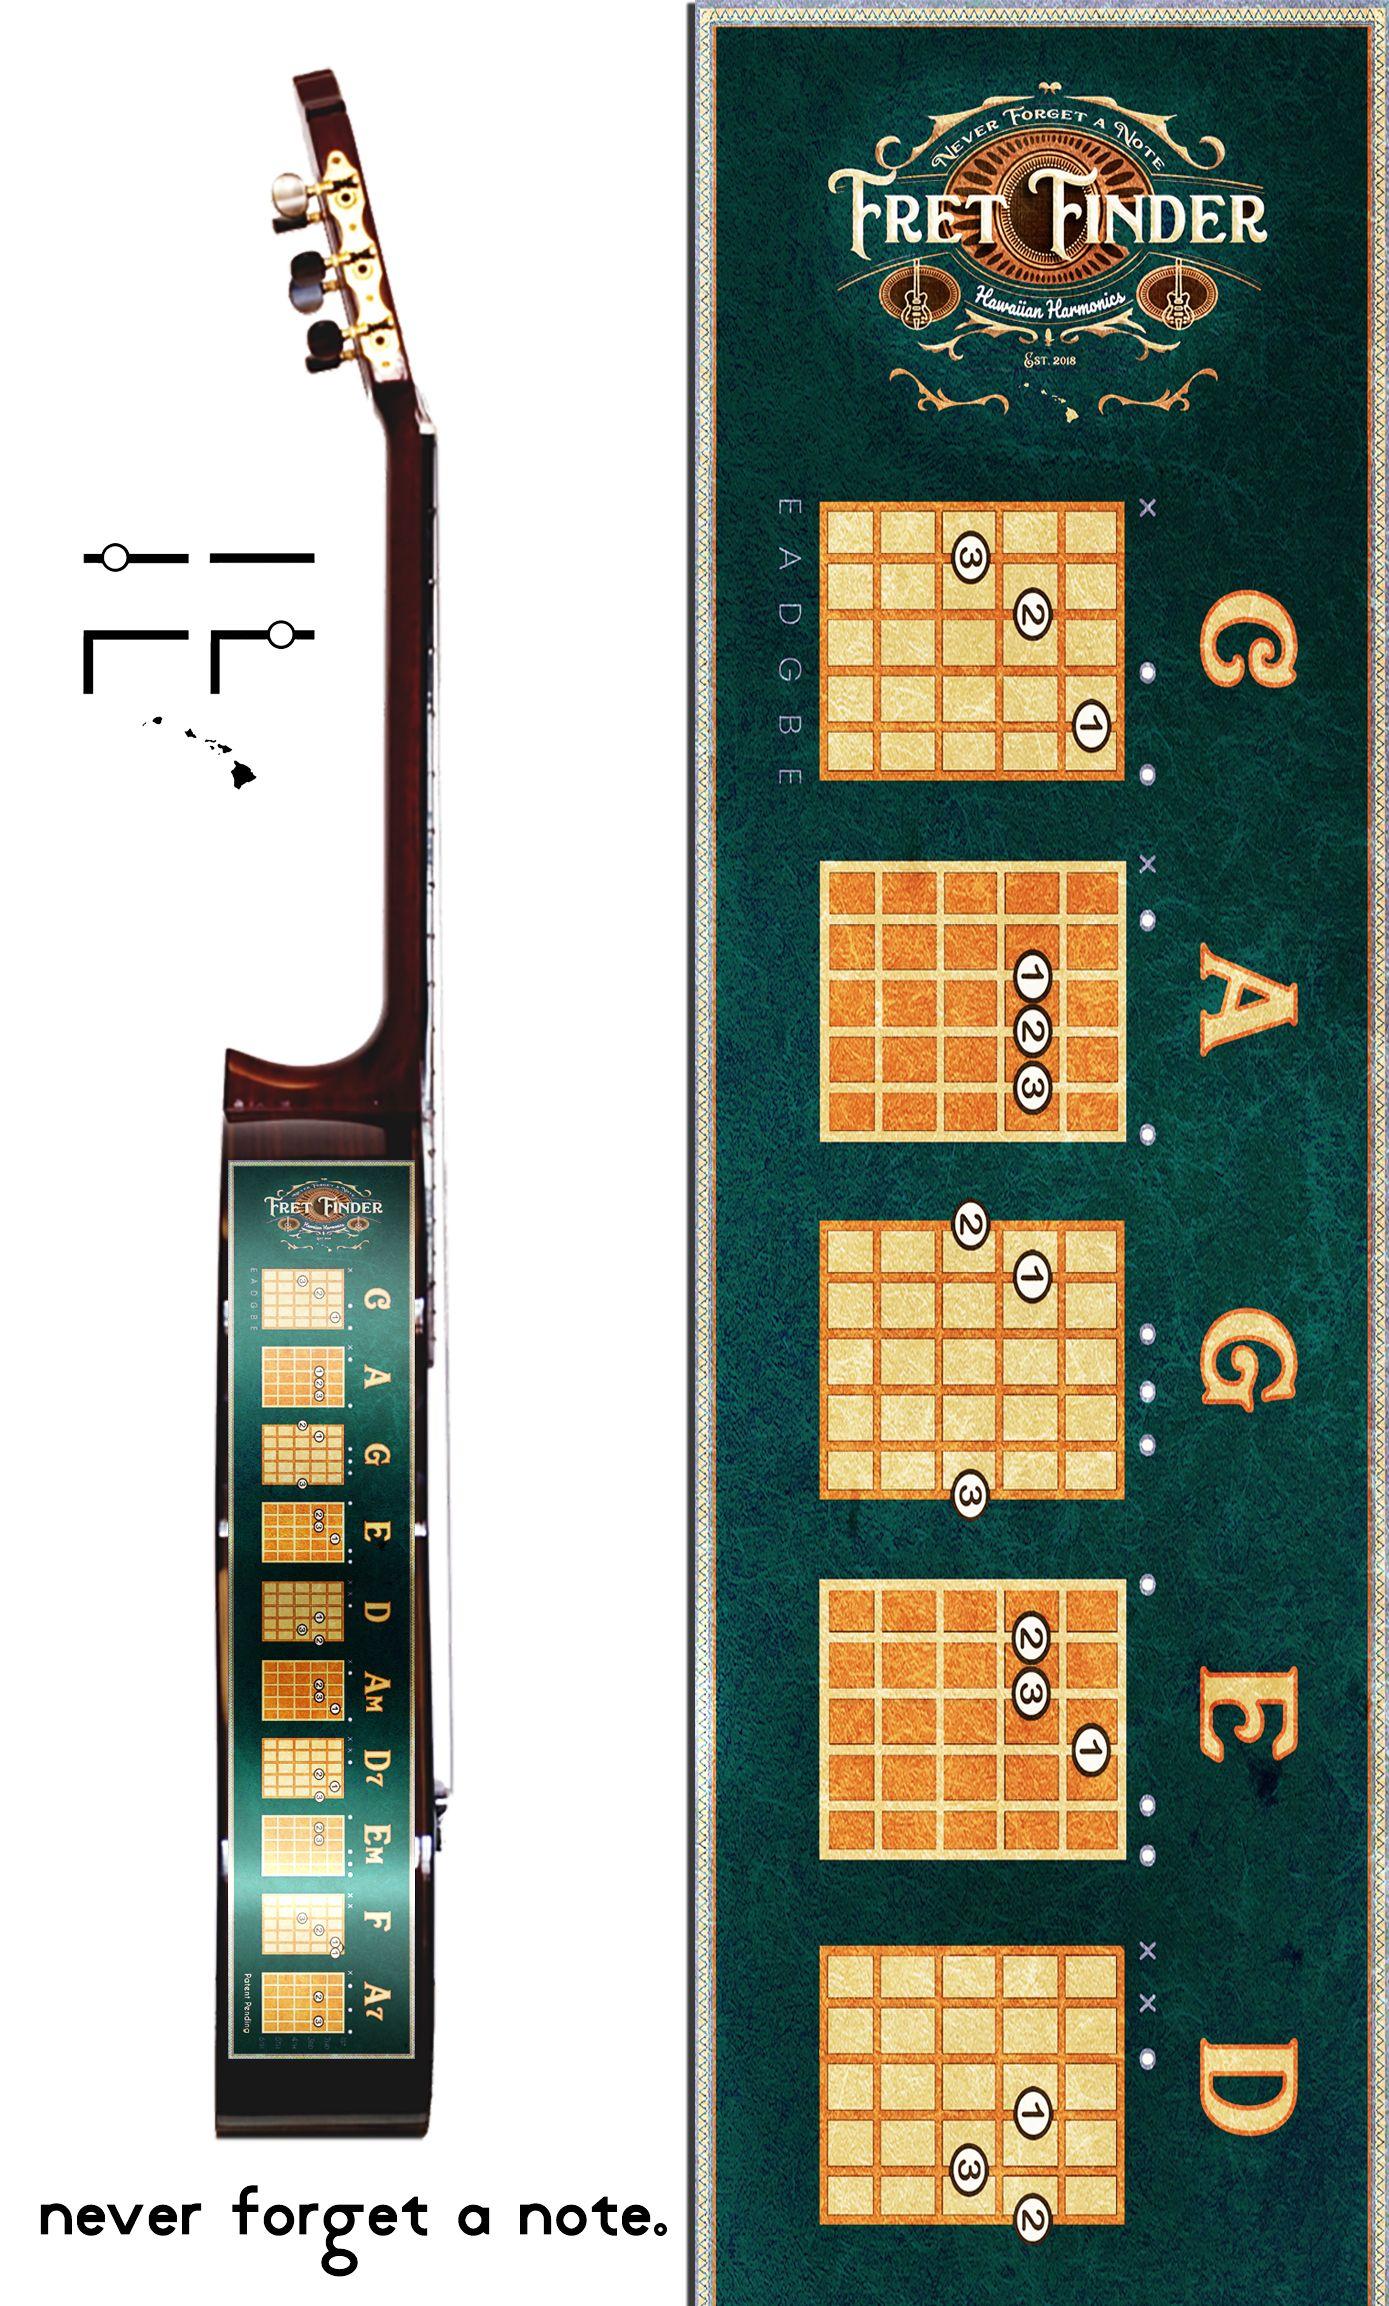 Guitar Chord Chart Cling Caddy Fret Finder by Hawaiian